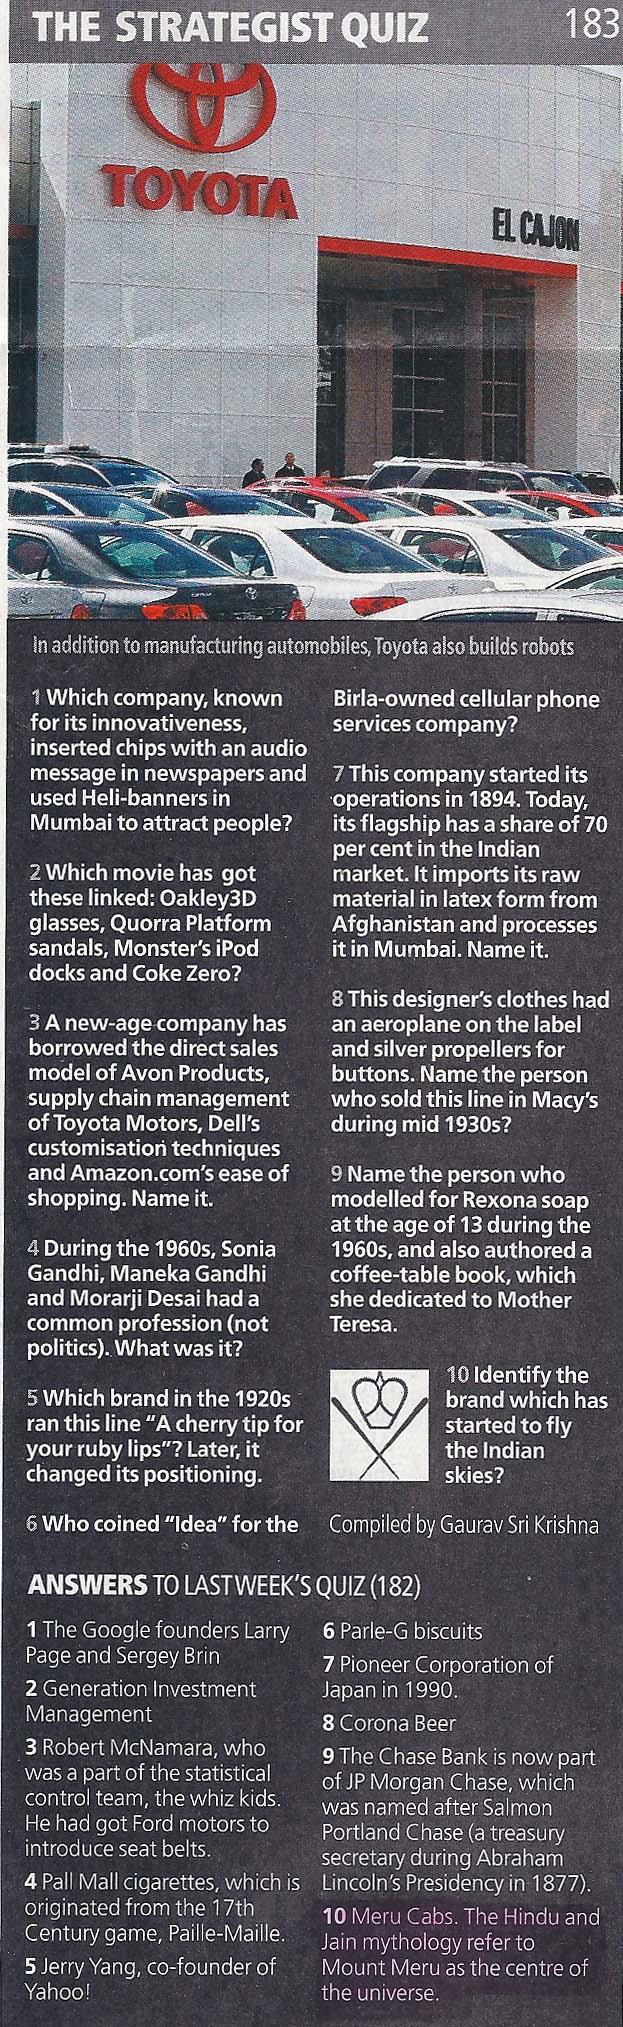 Business Standard, 10th Jan 10, P-2.jpg